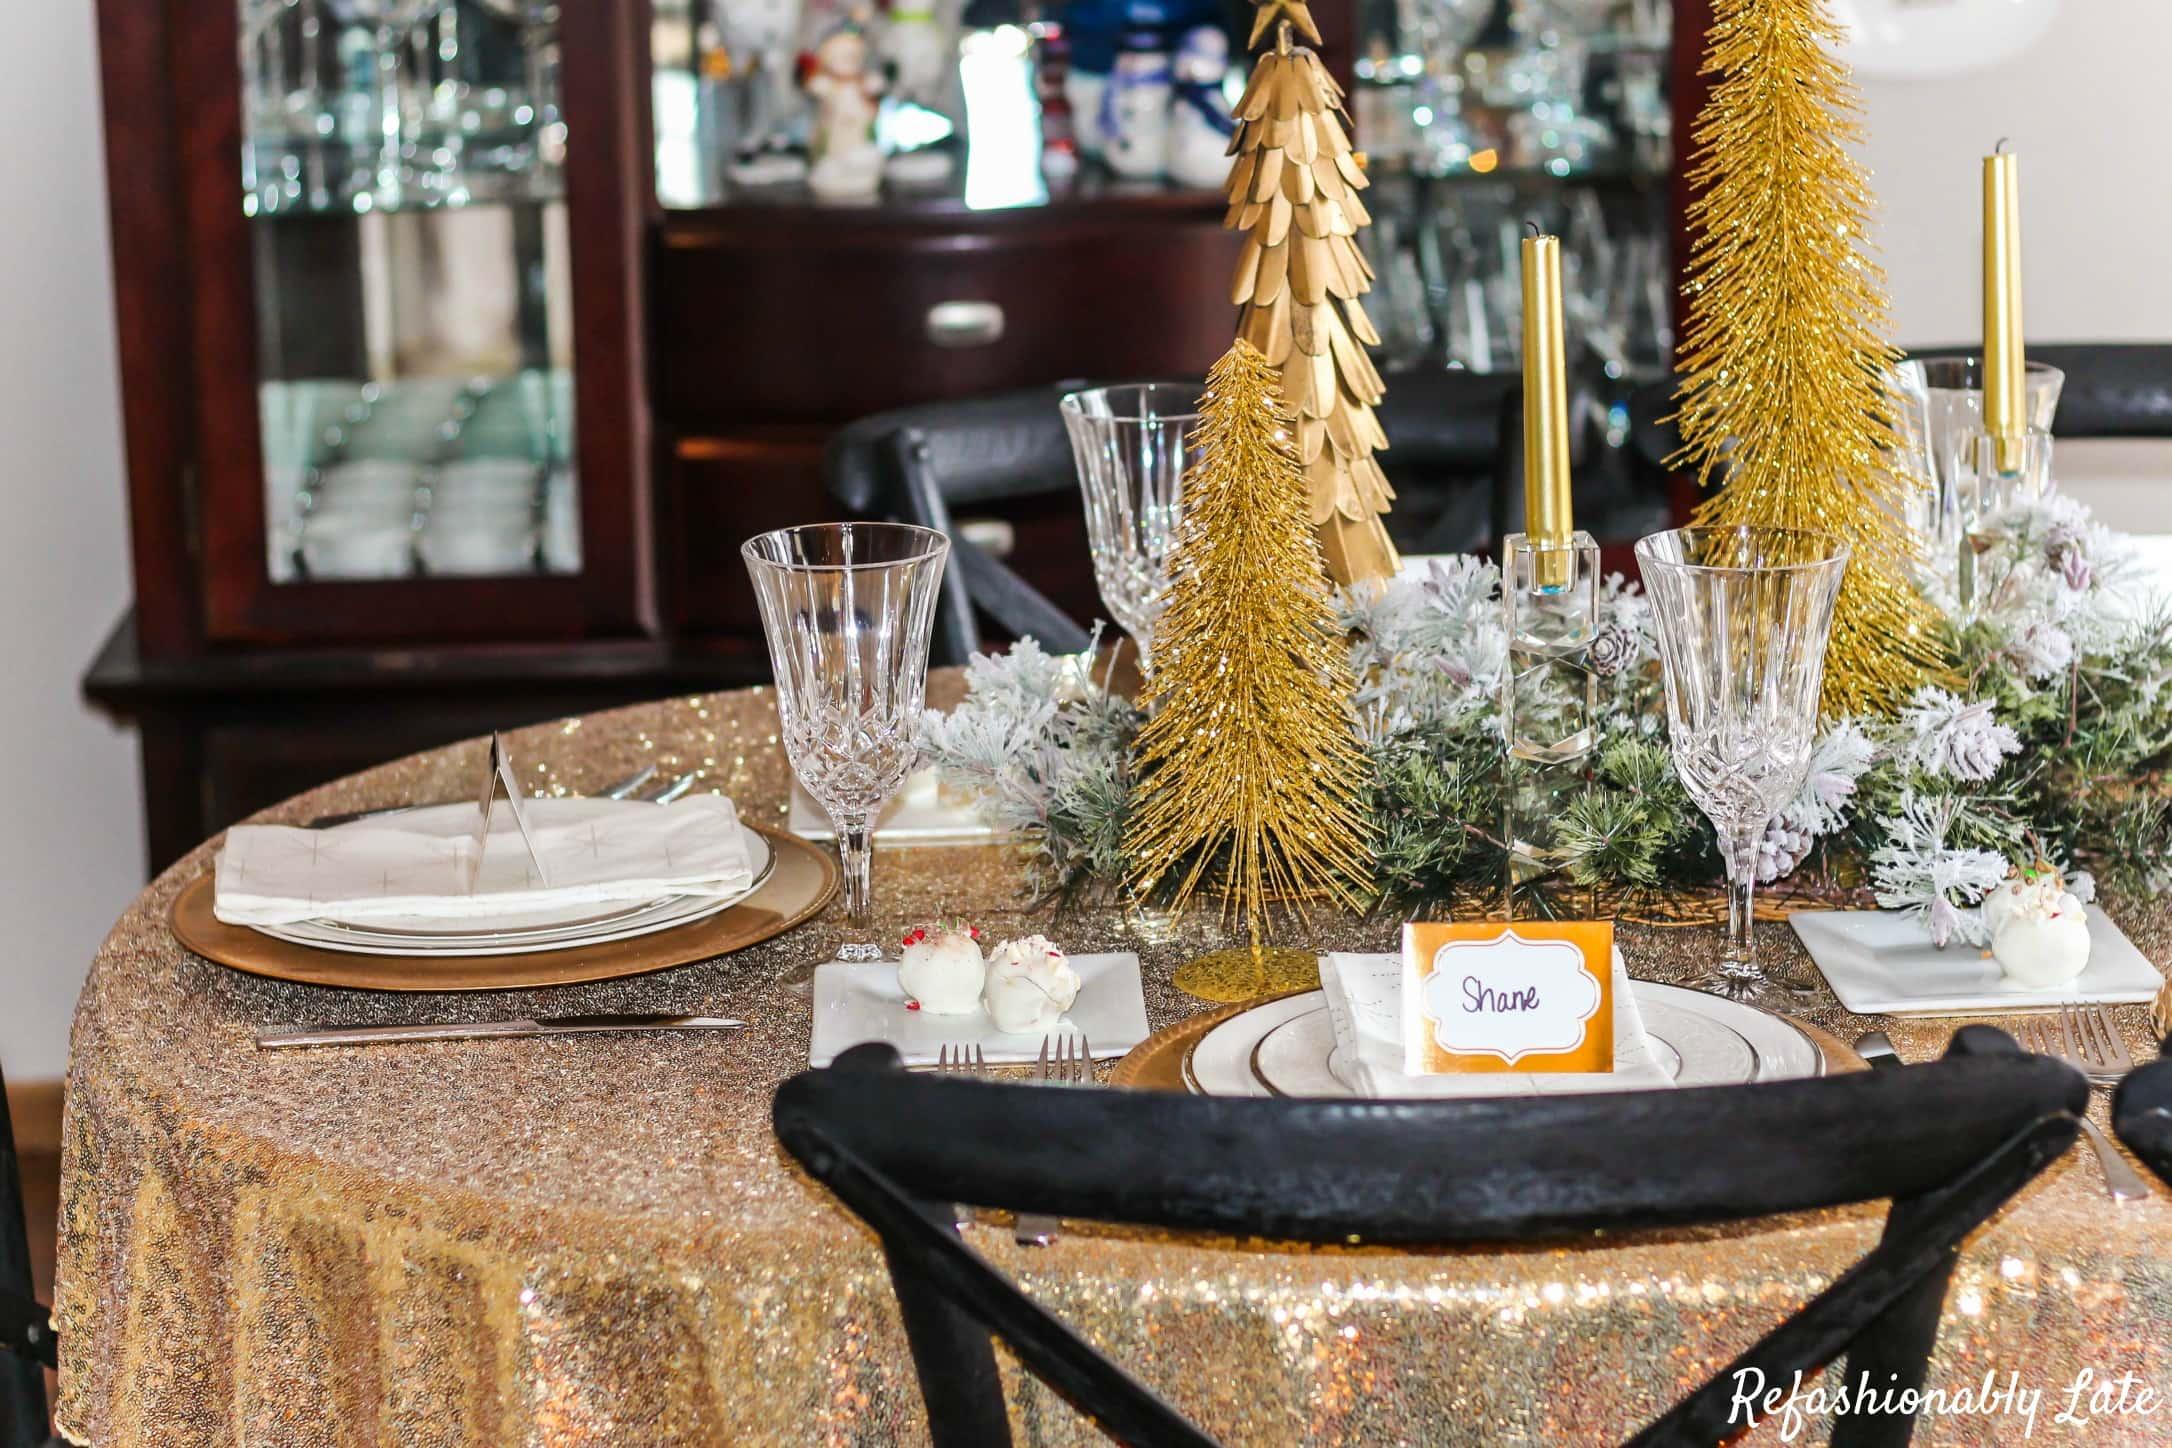 Glamorous Holiday Tablescape and Christmas Cake Truffles - www.refashionablylate.com